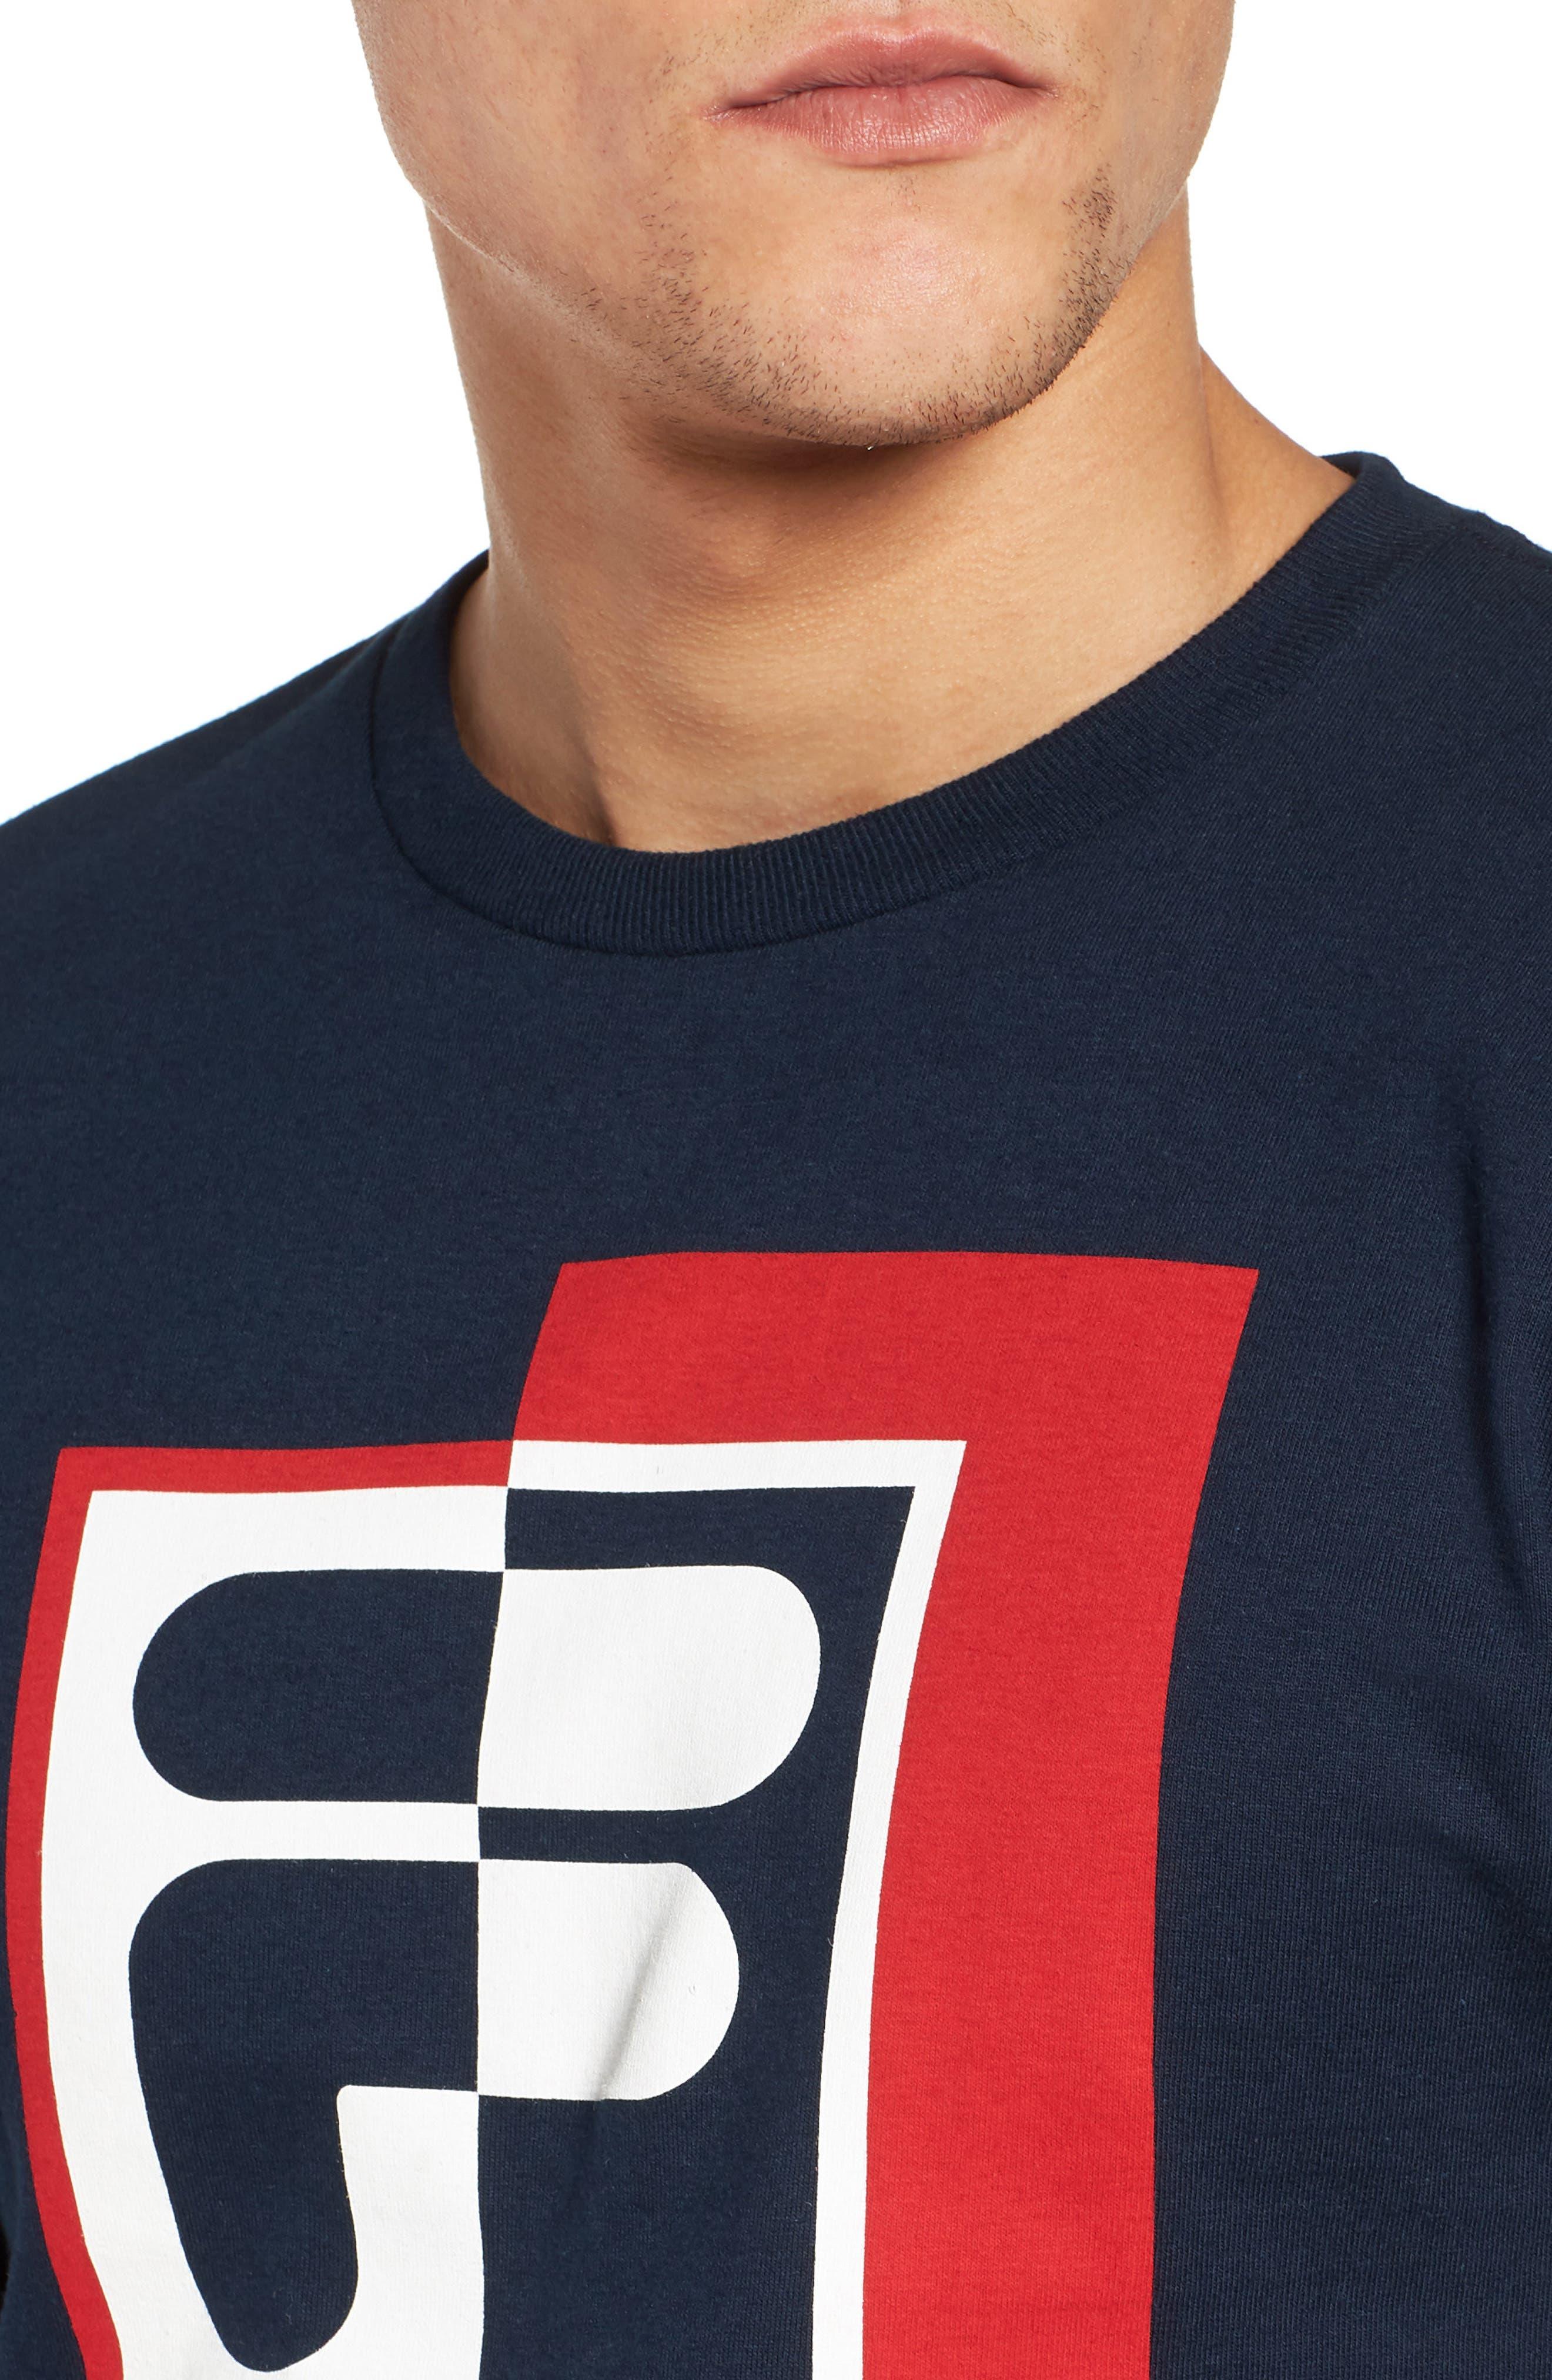 Rexton Graphic T-Shirt,                             Alternate thumbnail 4, color,                             410